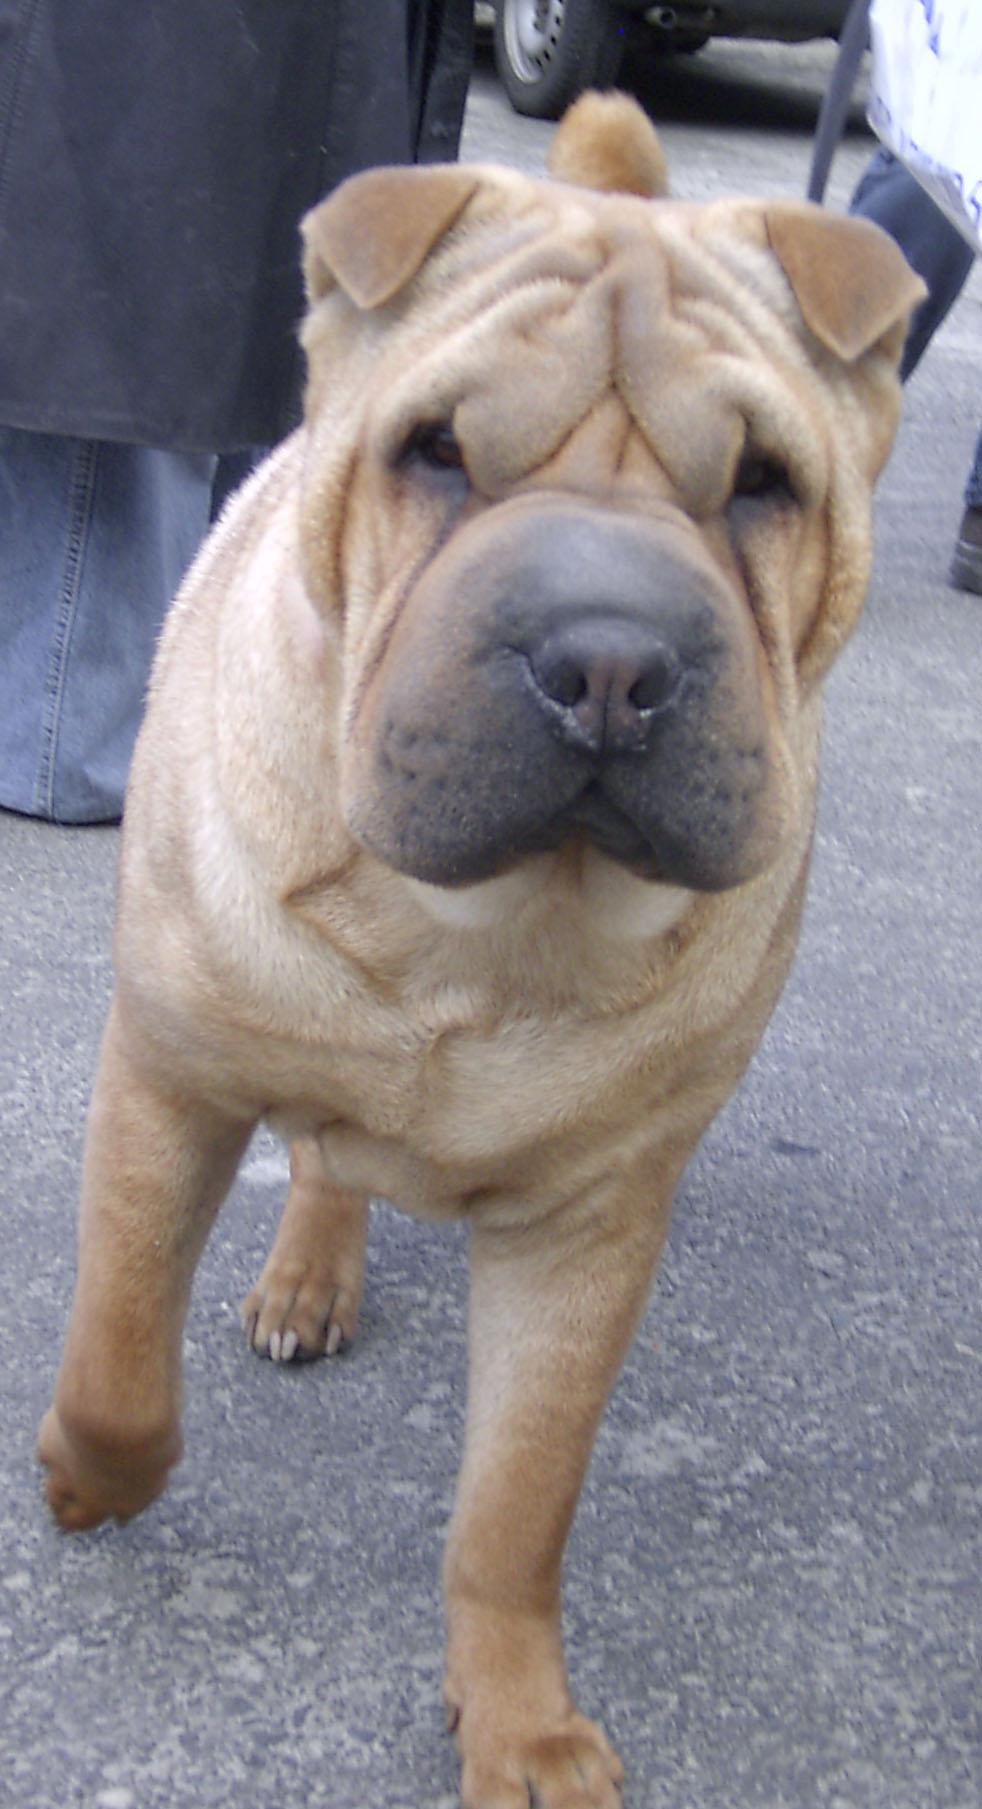 bulldog pictures, shar-pei pictures, american bulldog videos, shar-pei